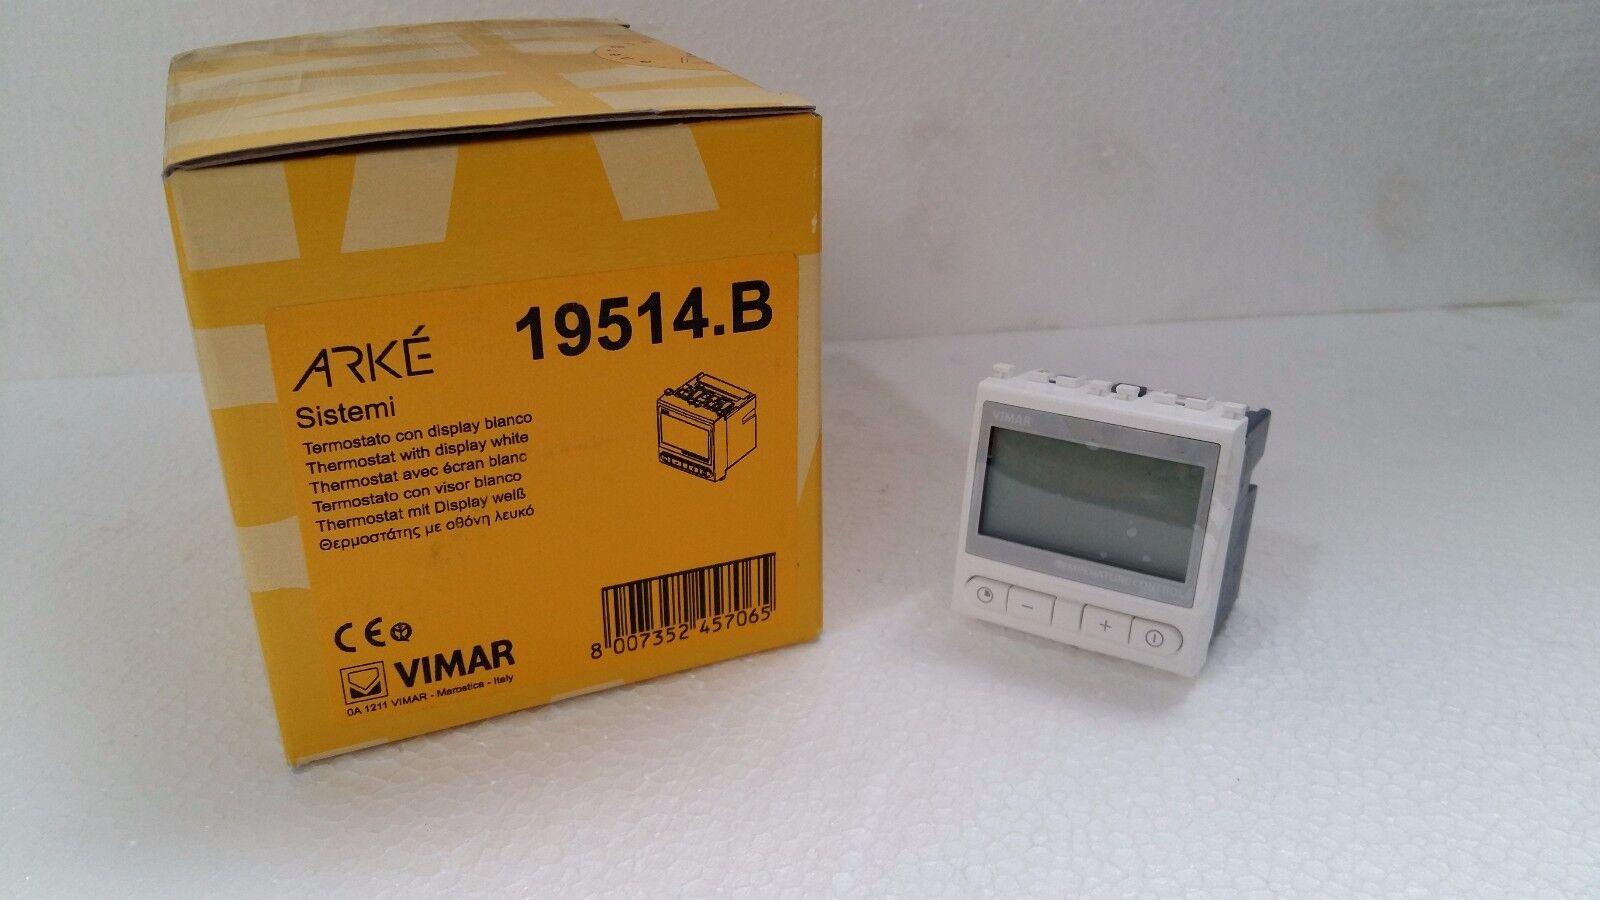 VIMAR 19514.B Thermostat Thermostat Thermostat Arke weiß Flush mount display Home-Automation von-mir 6ab9e2